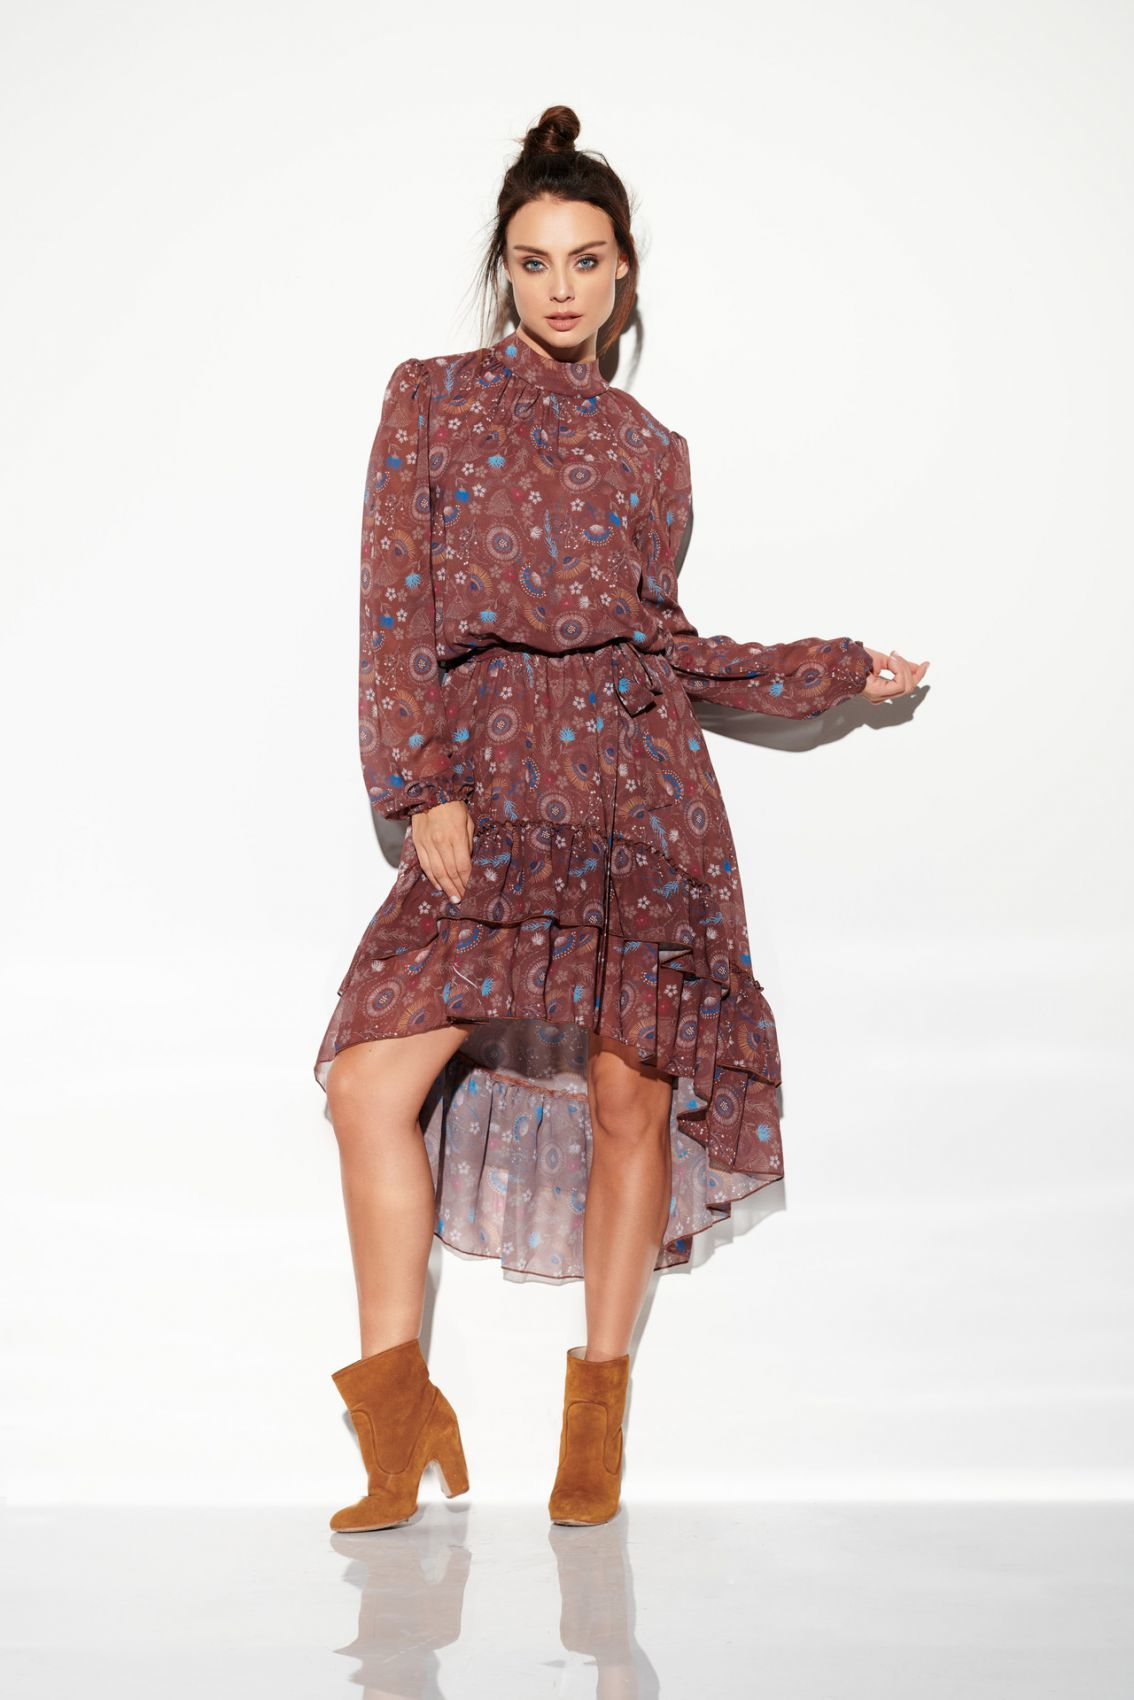 1 Sukienka LG504 druk 9 PROMO